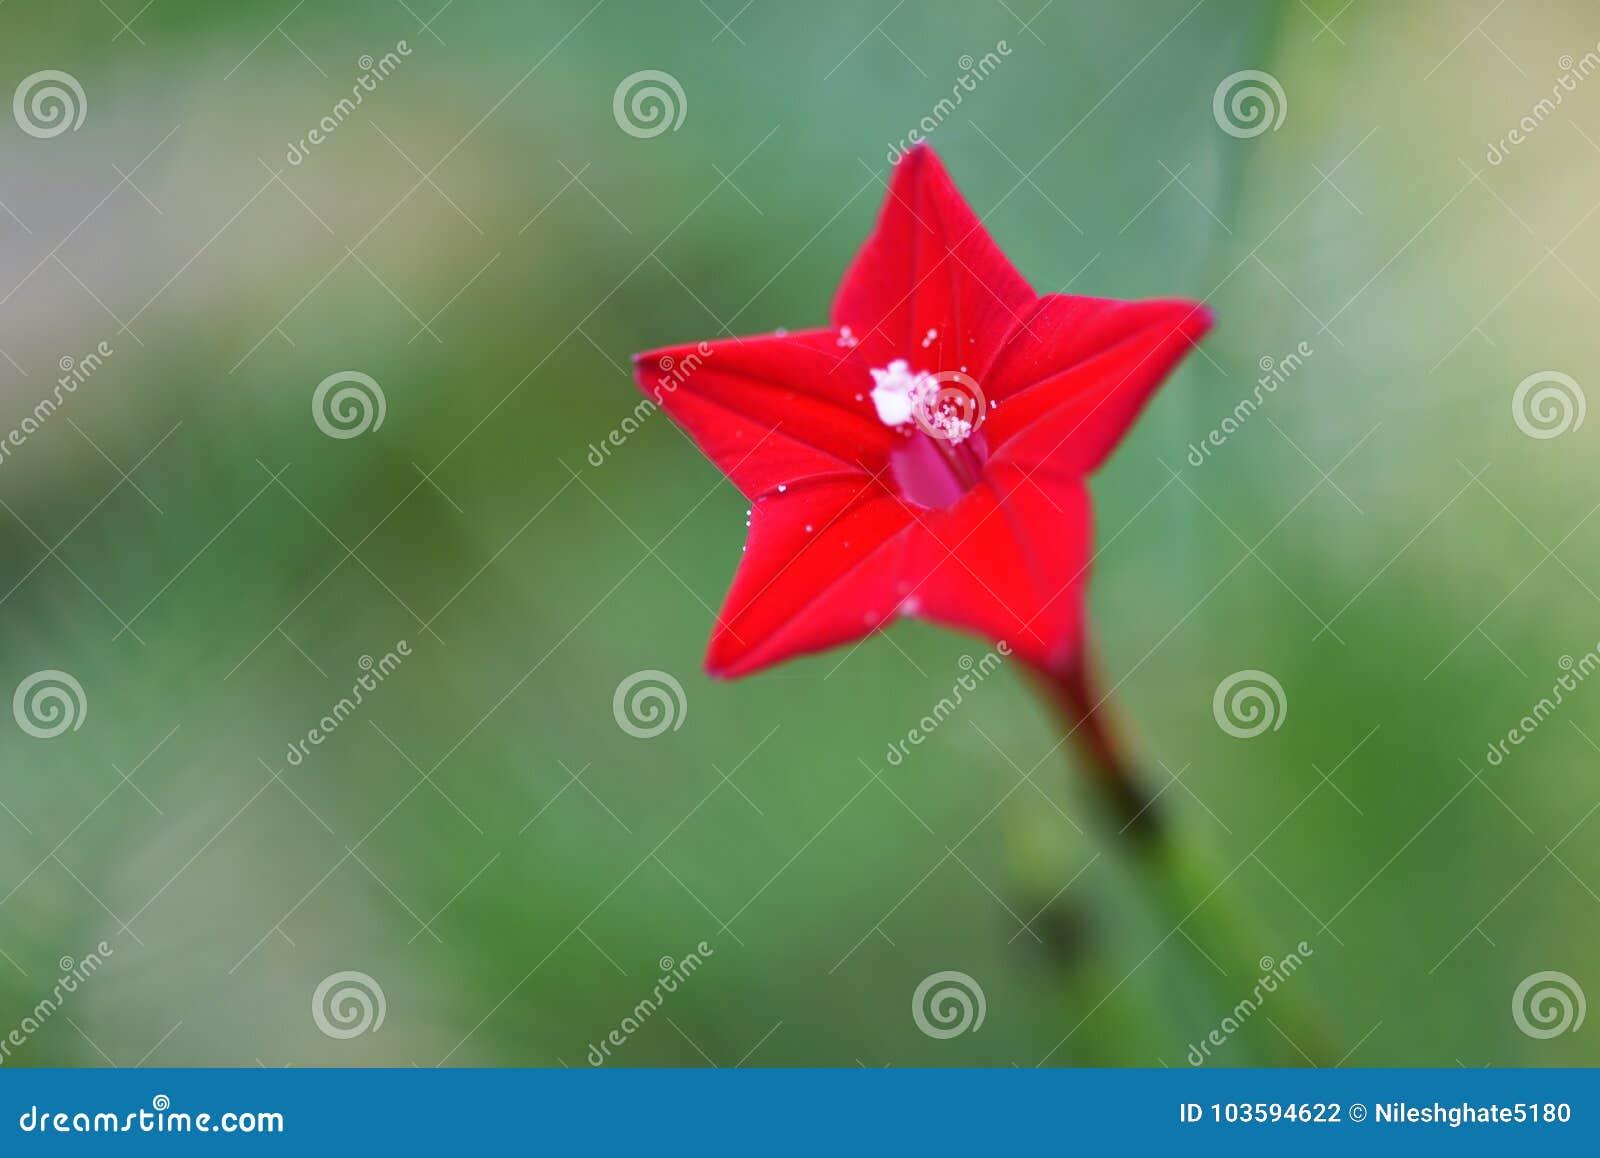 Wallpaper Unique   Unique Beautiful Red Star Flower Stock Photo Image Of Wallpaper